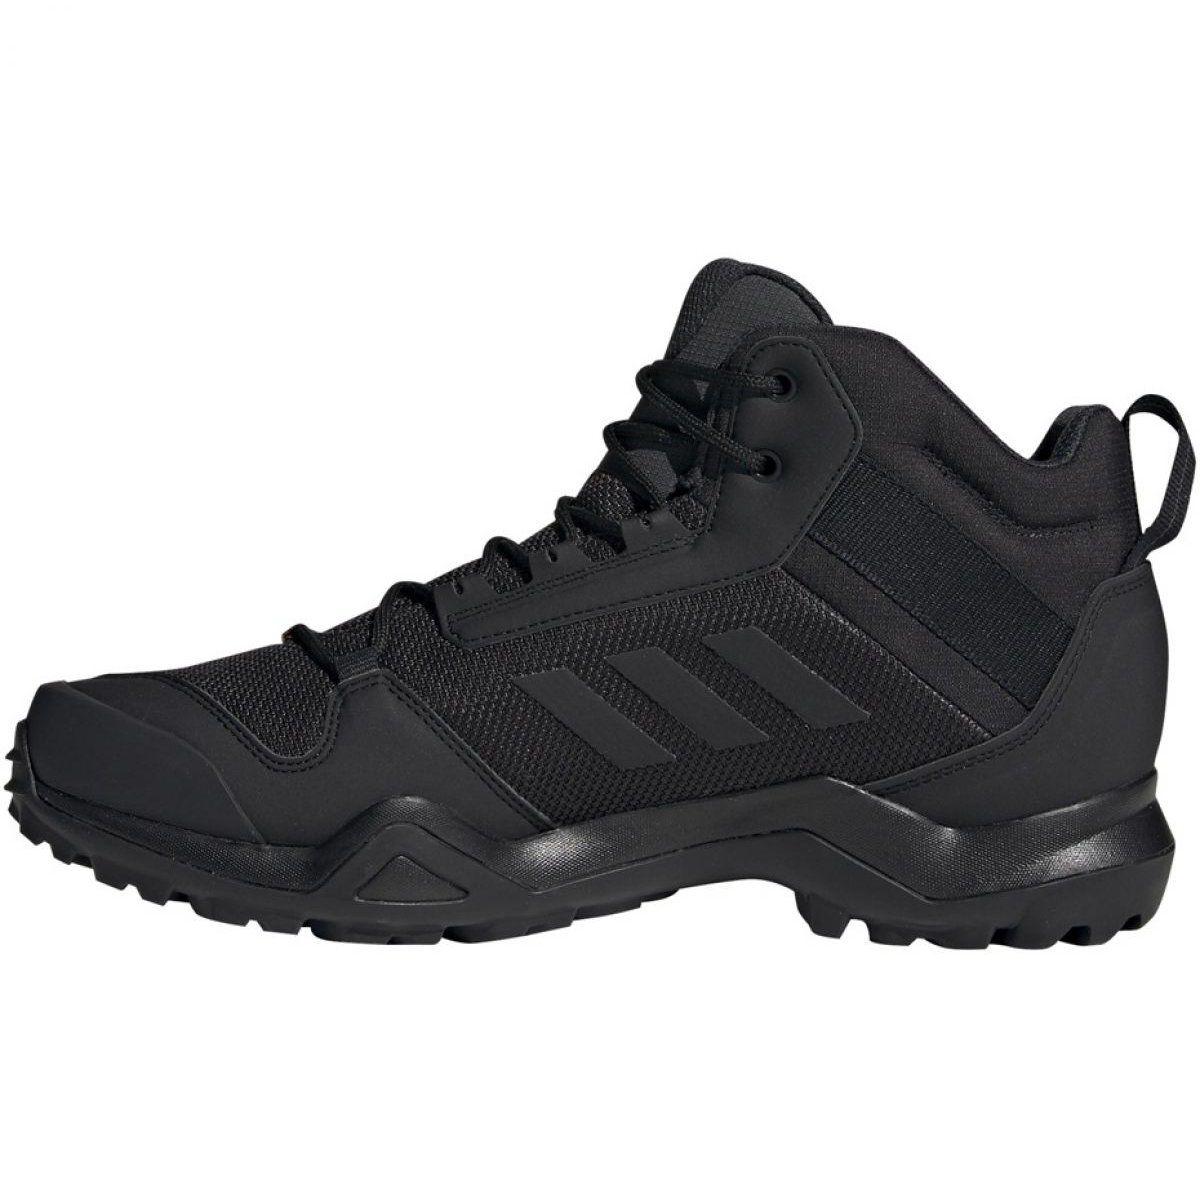 Trekking shoes adidas Terrex AX3 Mid Gtx Vz M BC0466 black ...